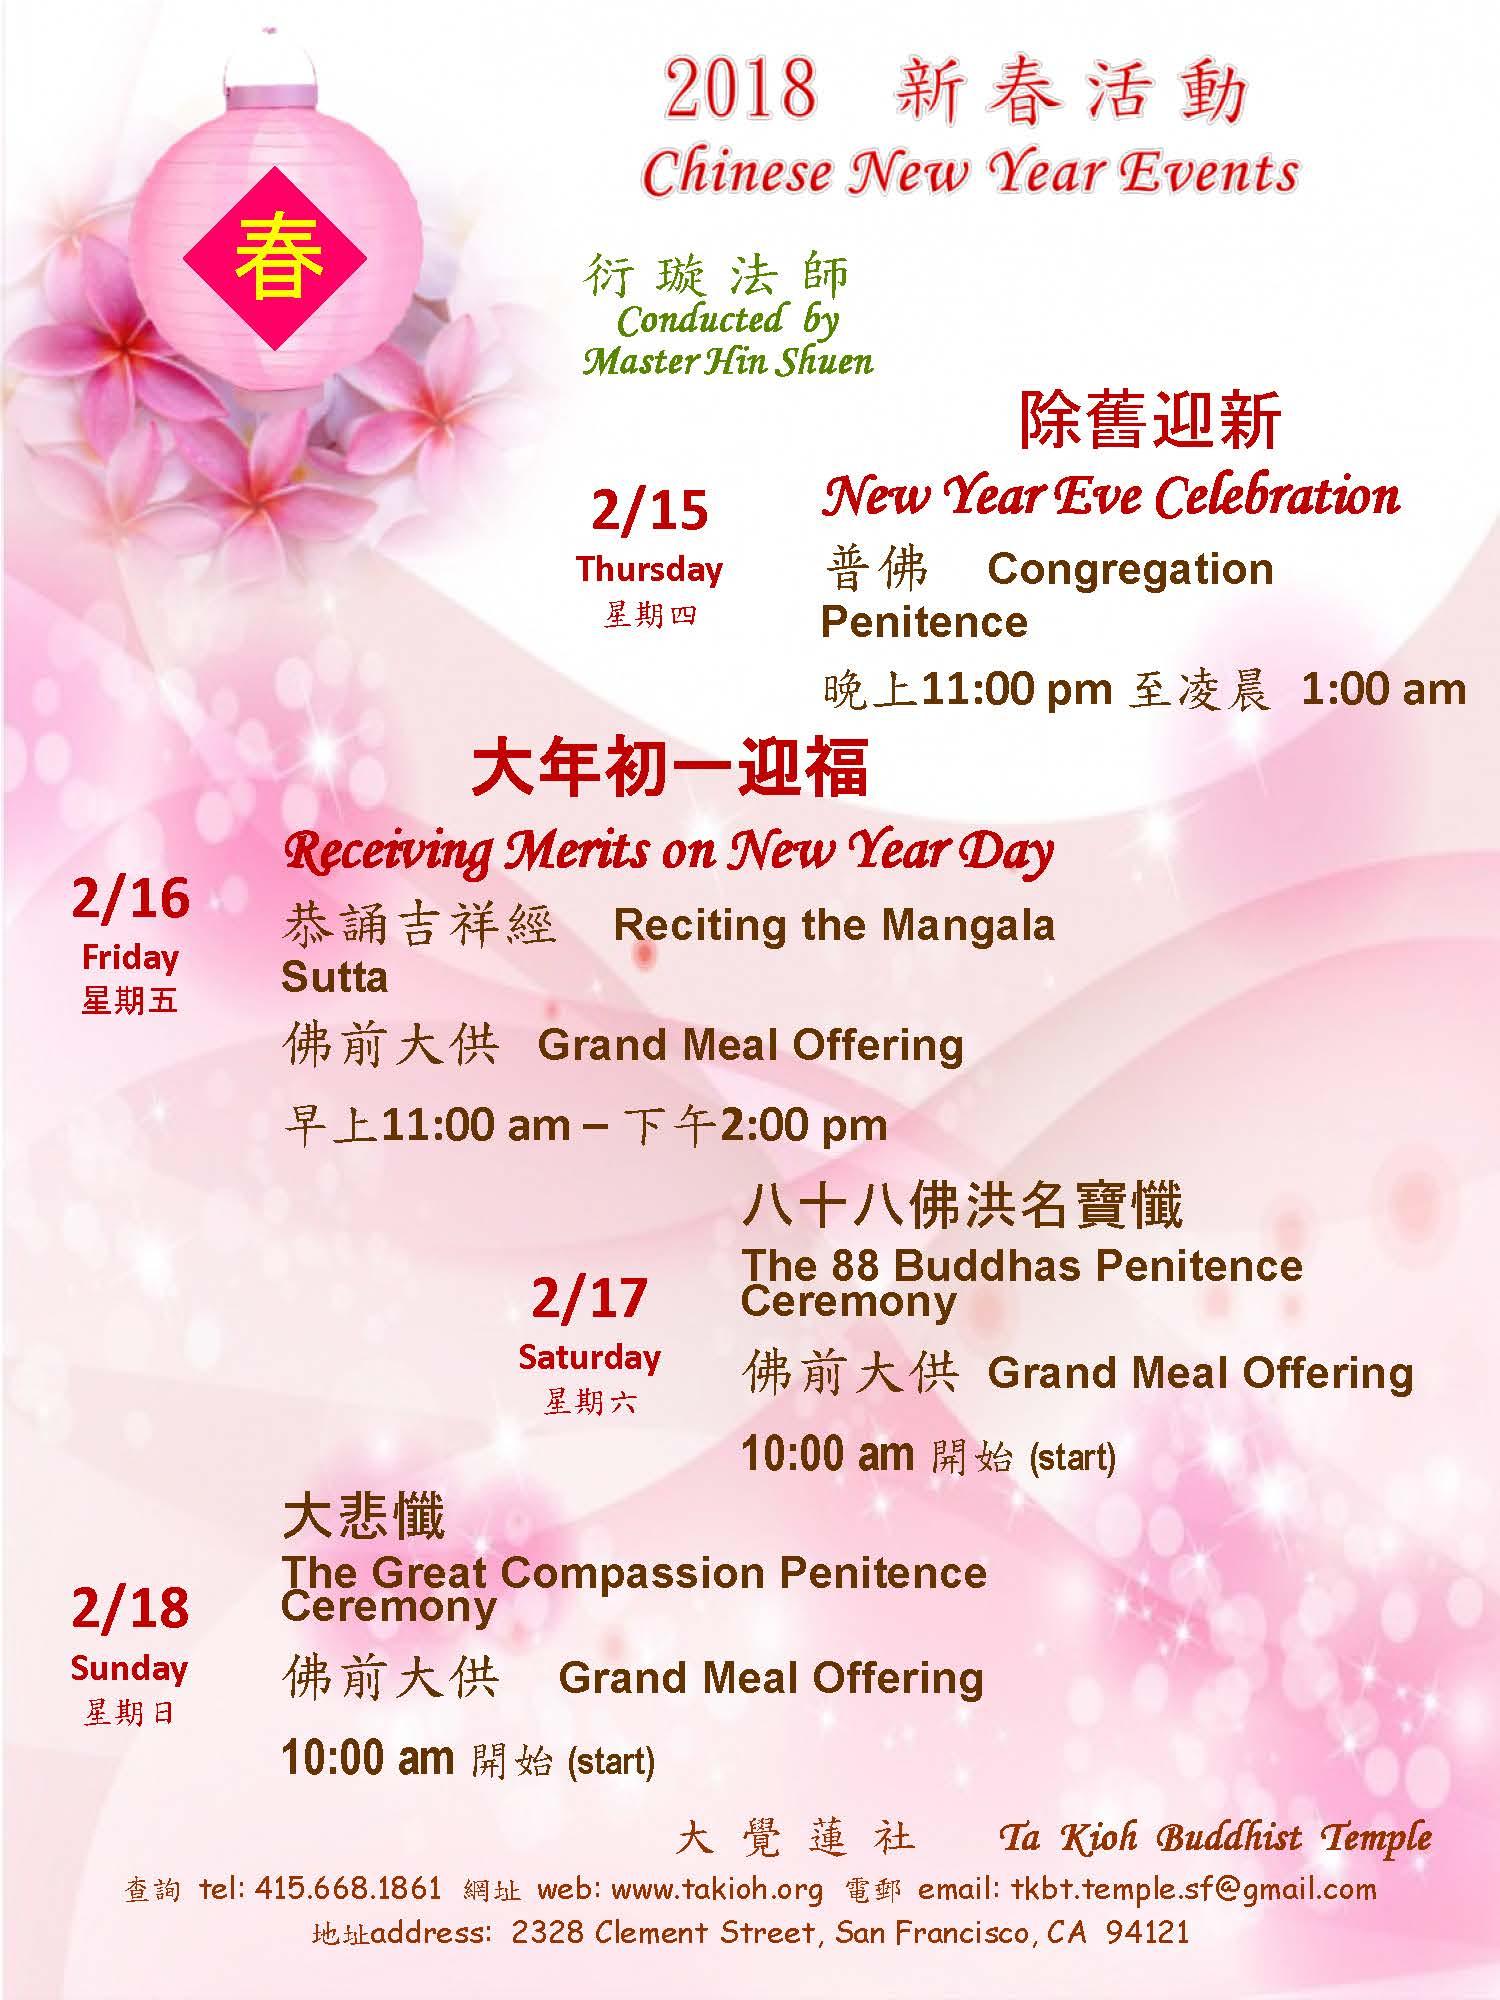 Lunar New Year event 2018